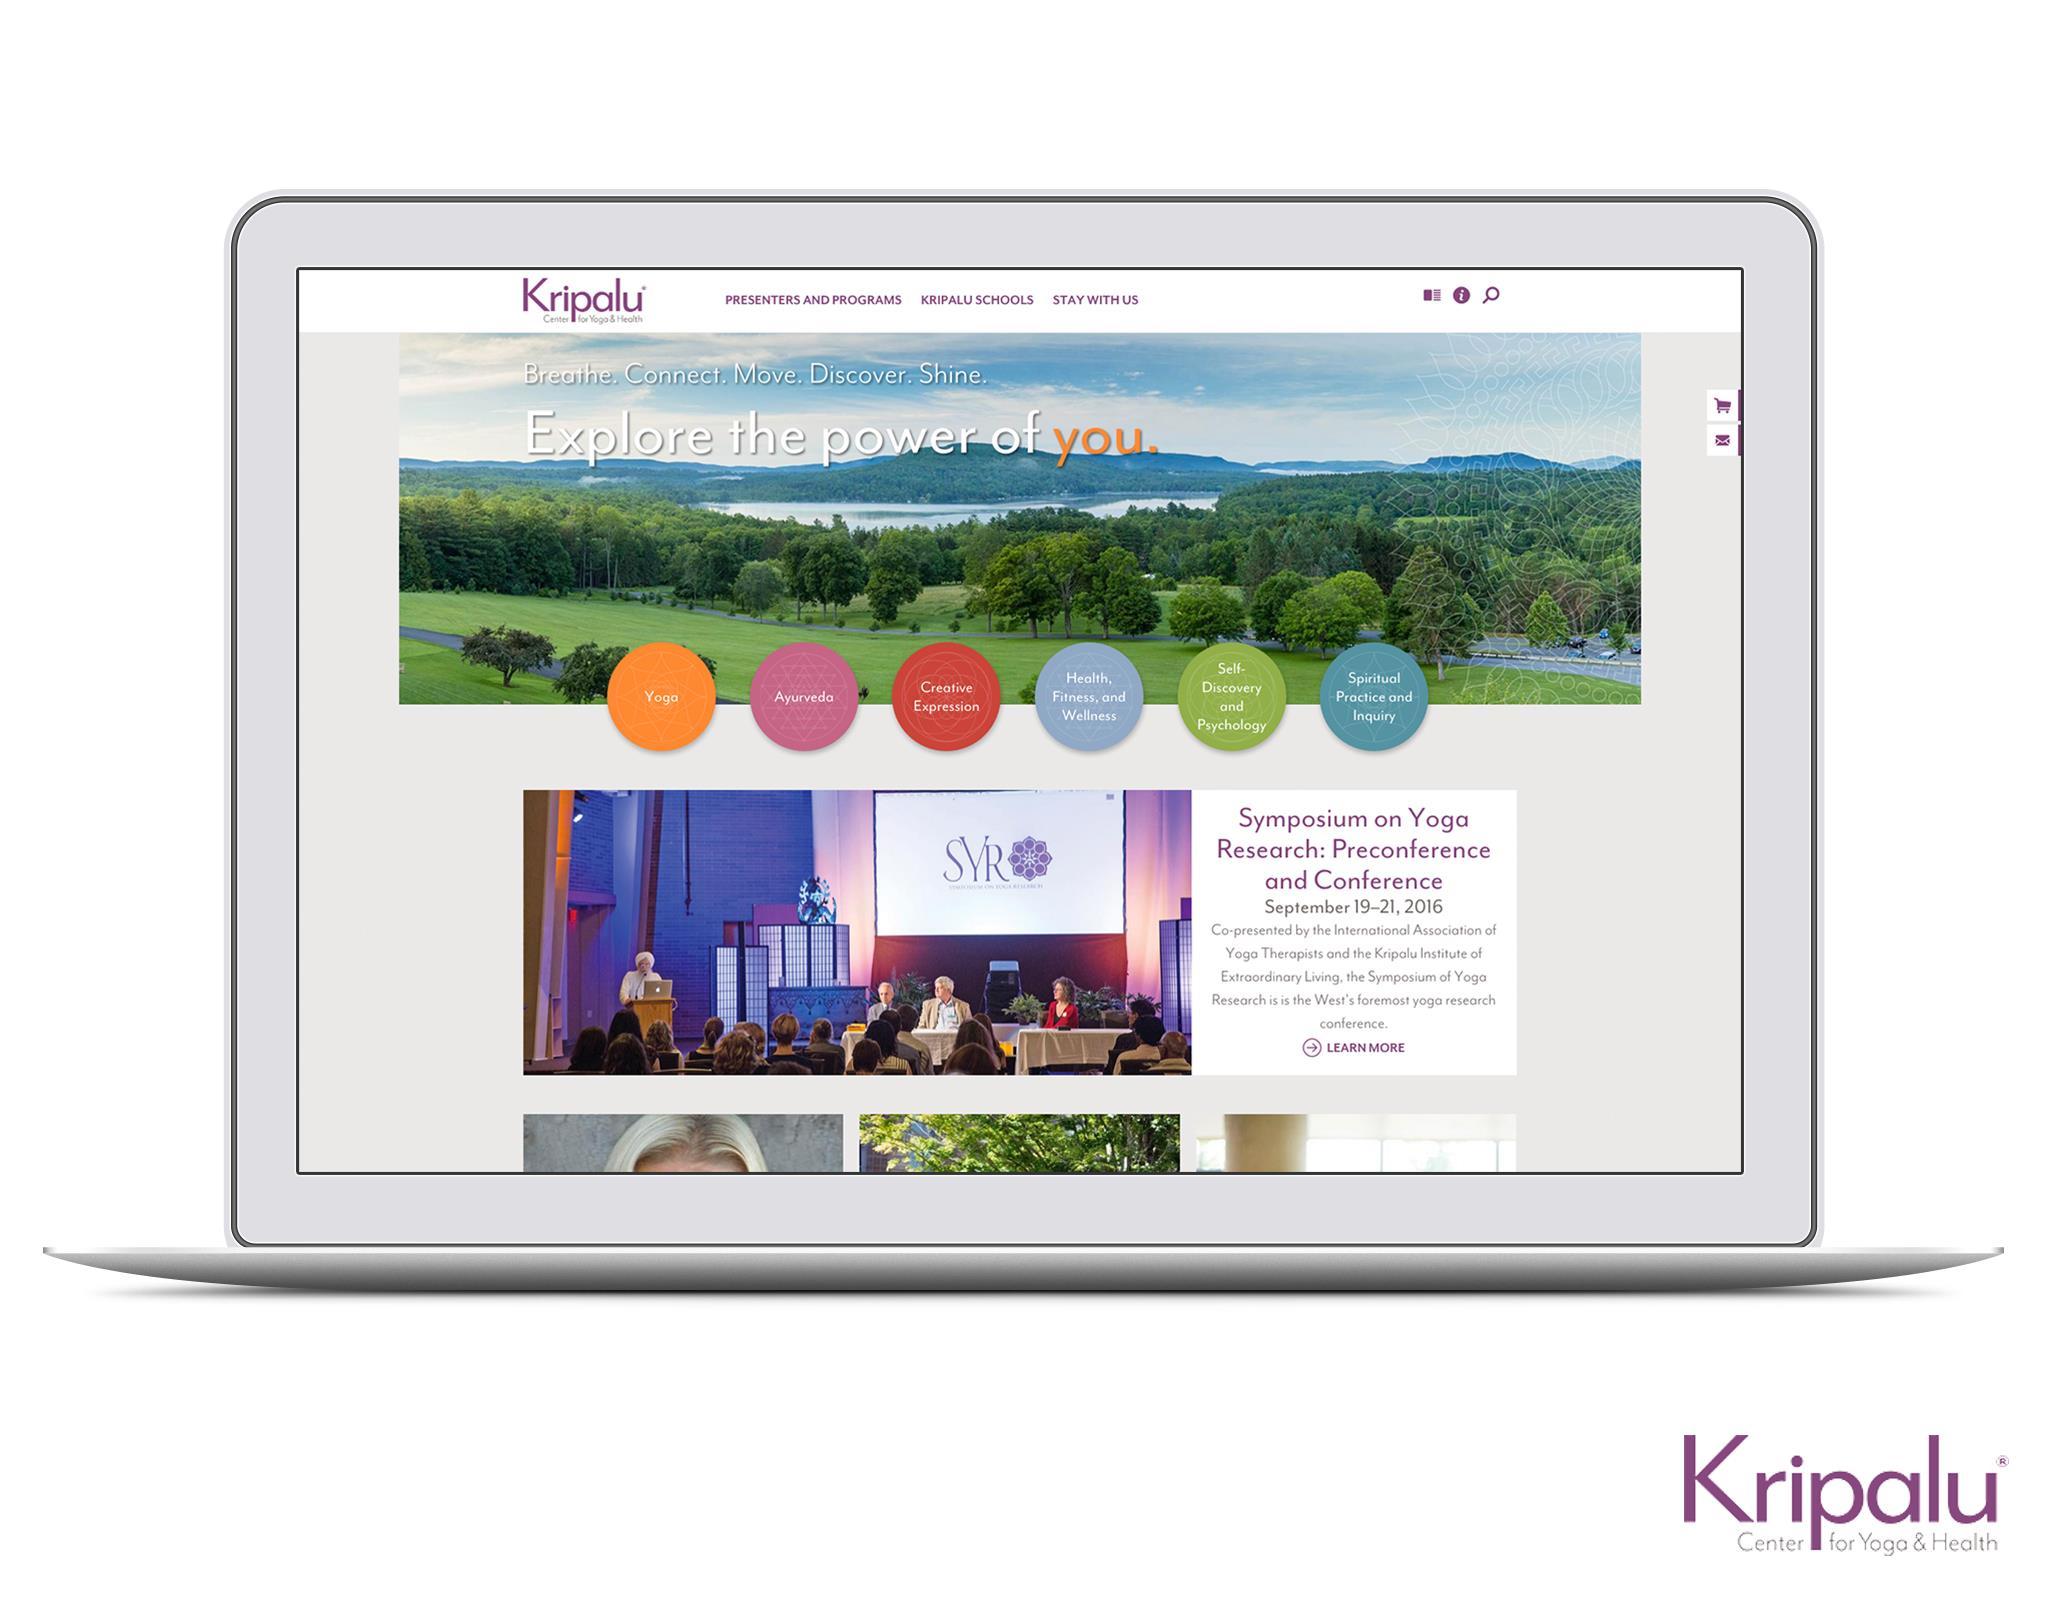 Kripalu: Explore the power of you